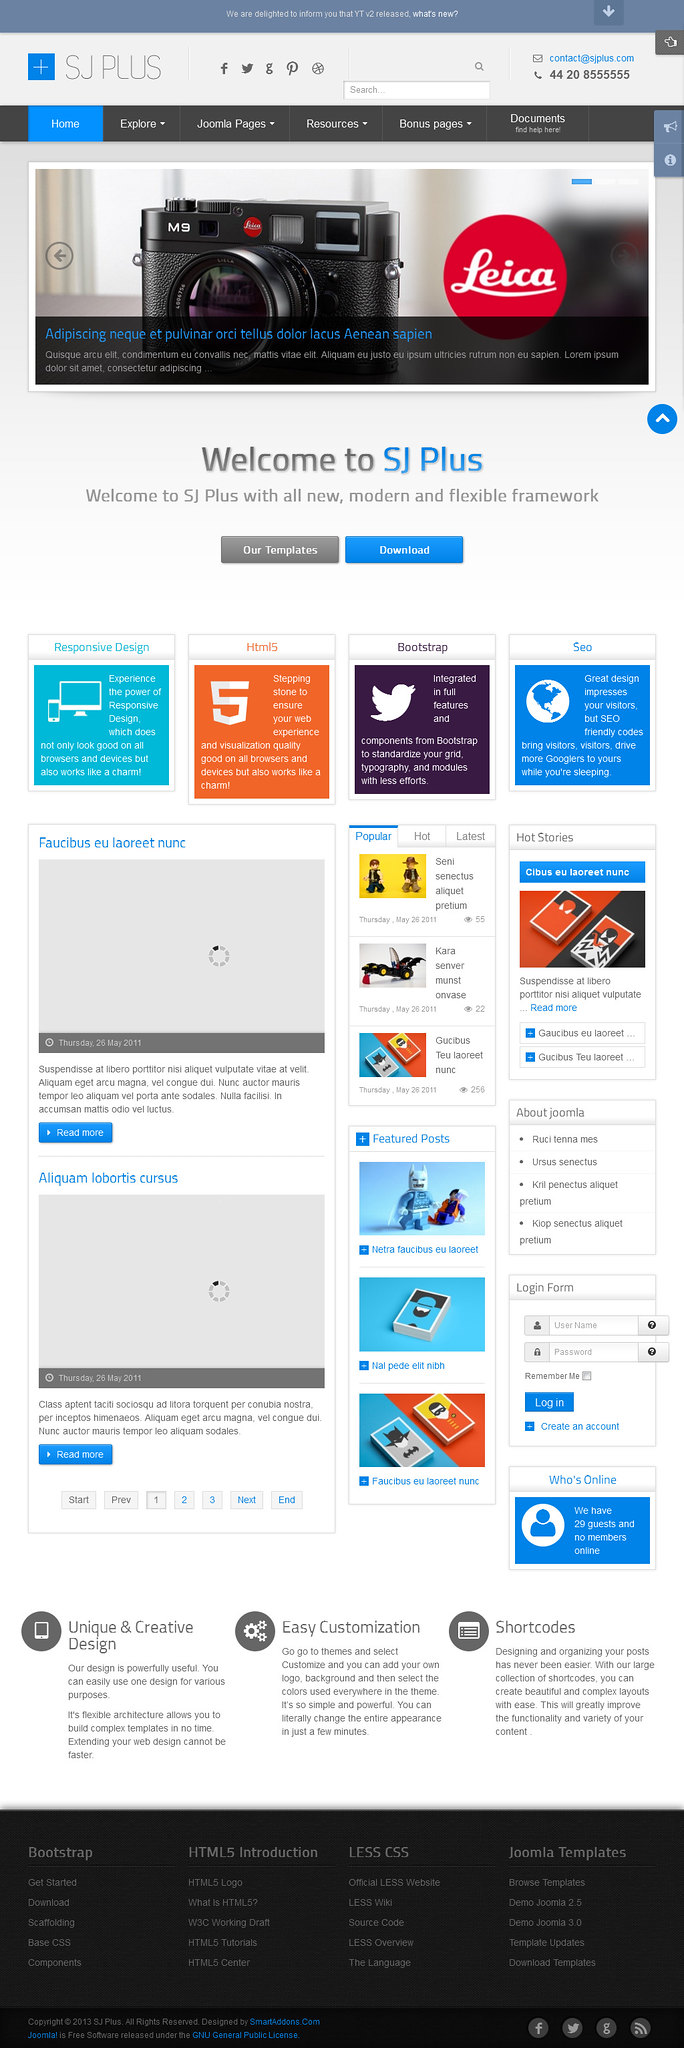 free joomla templates - download 7 free joomla 3 x responsive corporate templates